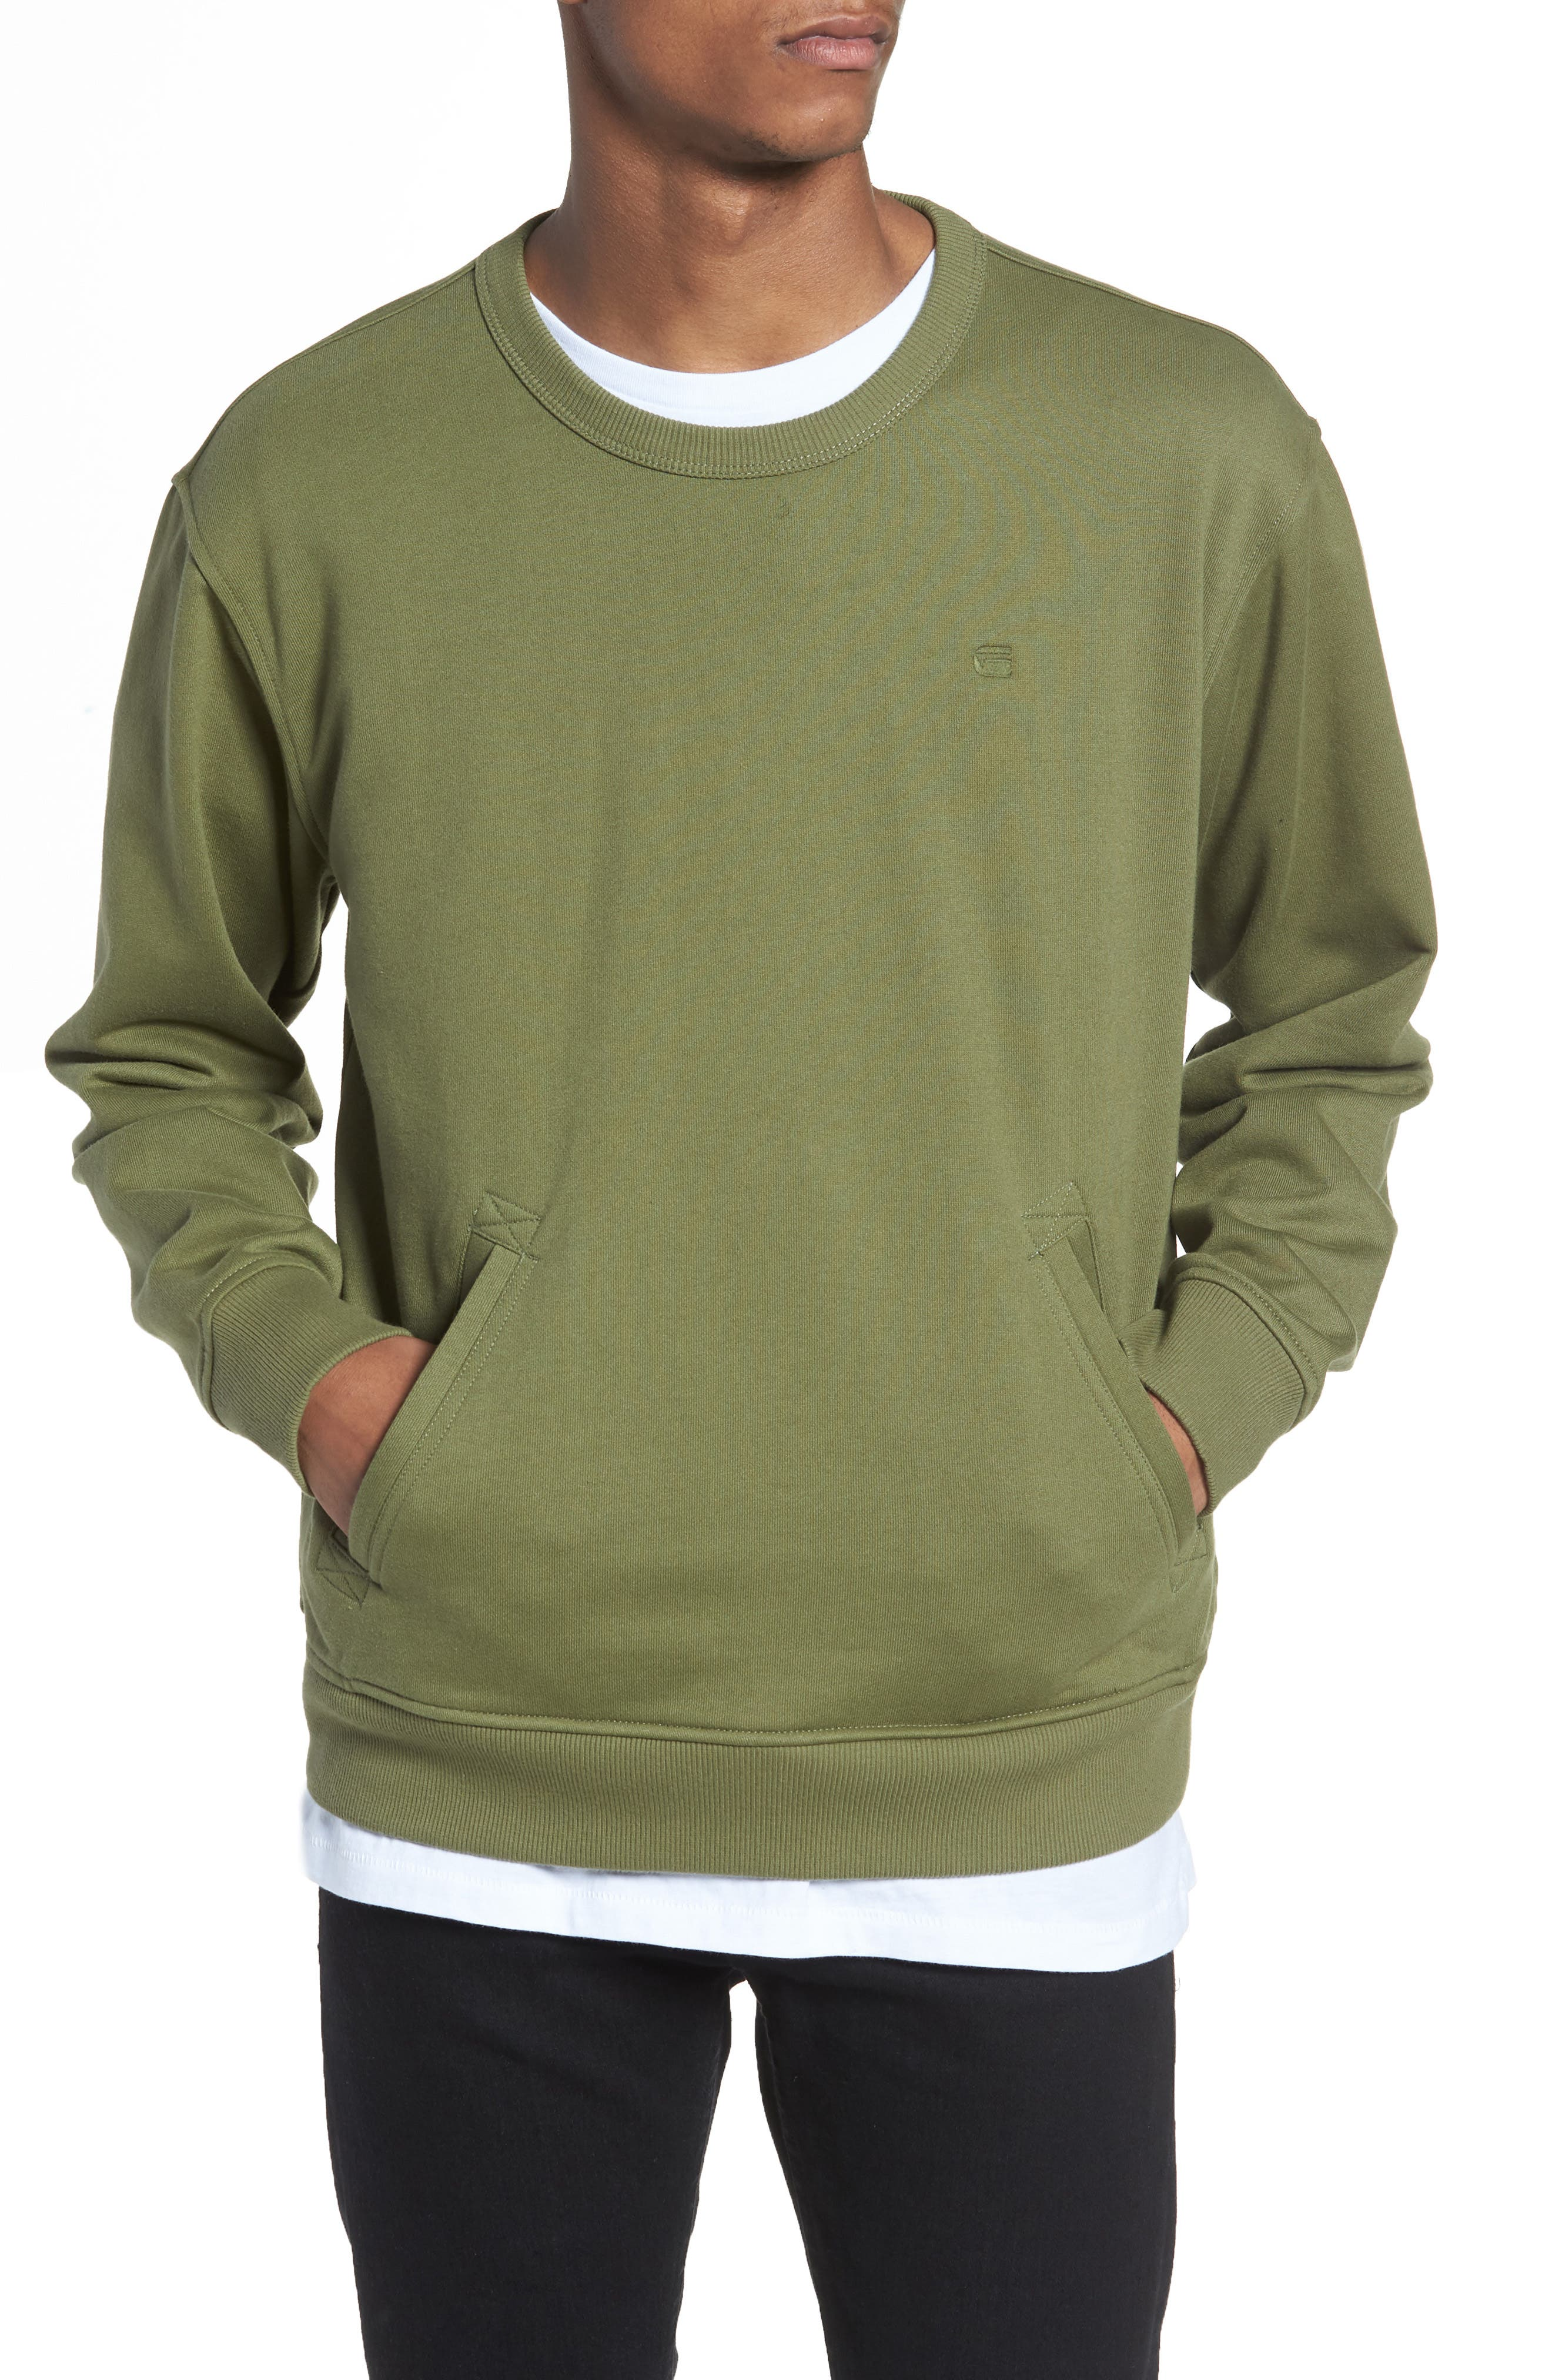 G-STAR RAW Core Hybrid Archive Sweatshirt, Main, color, 300